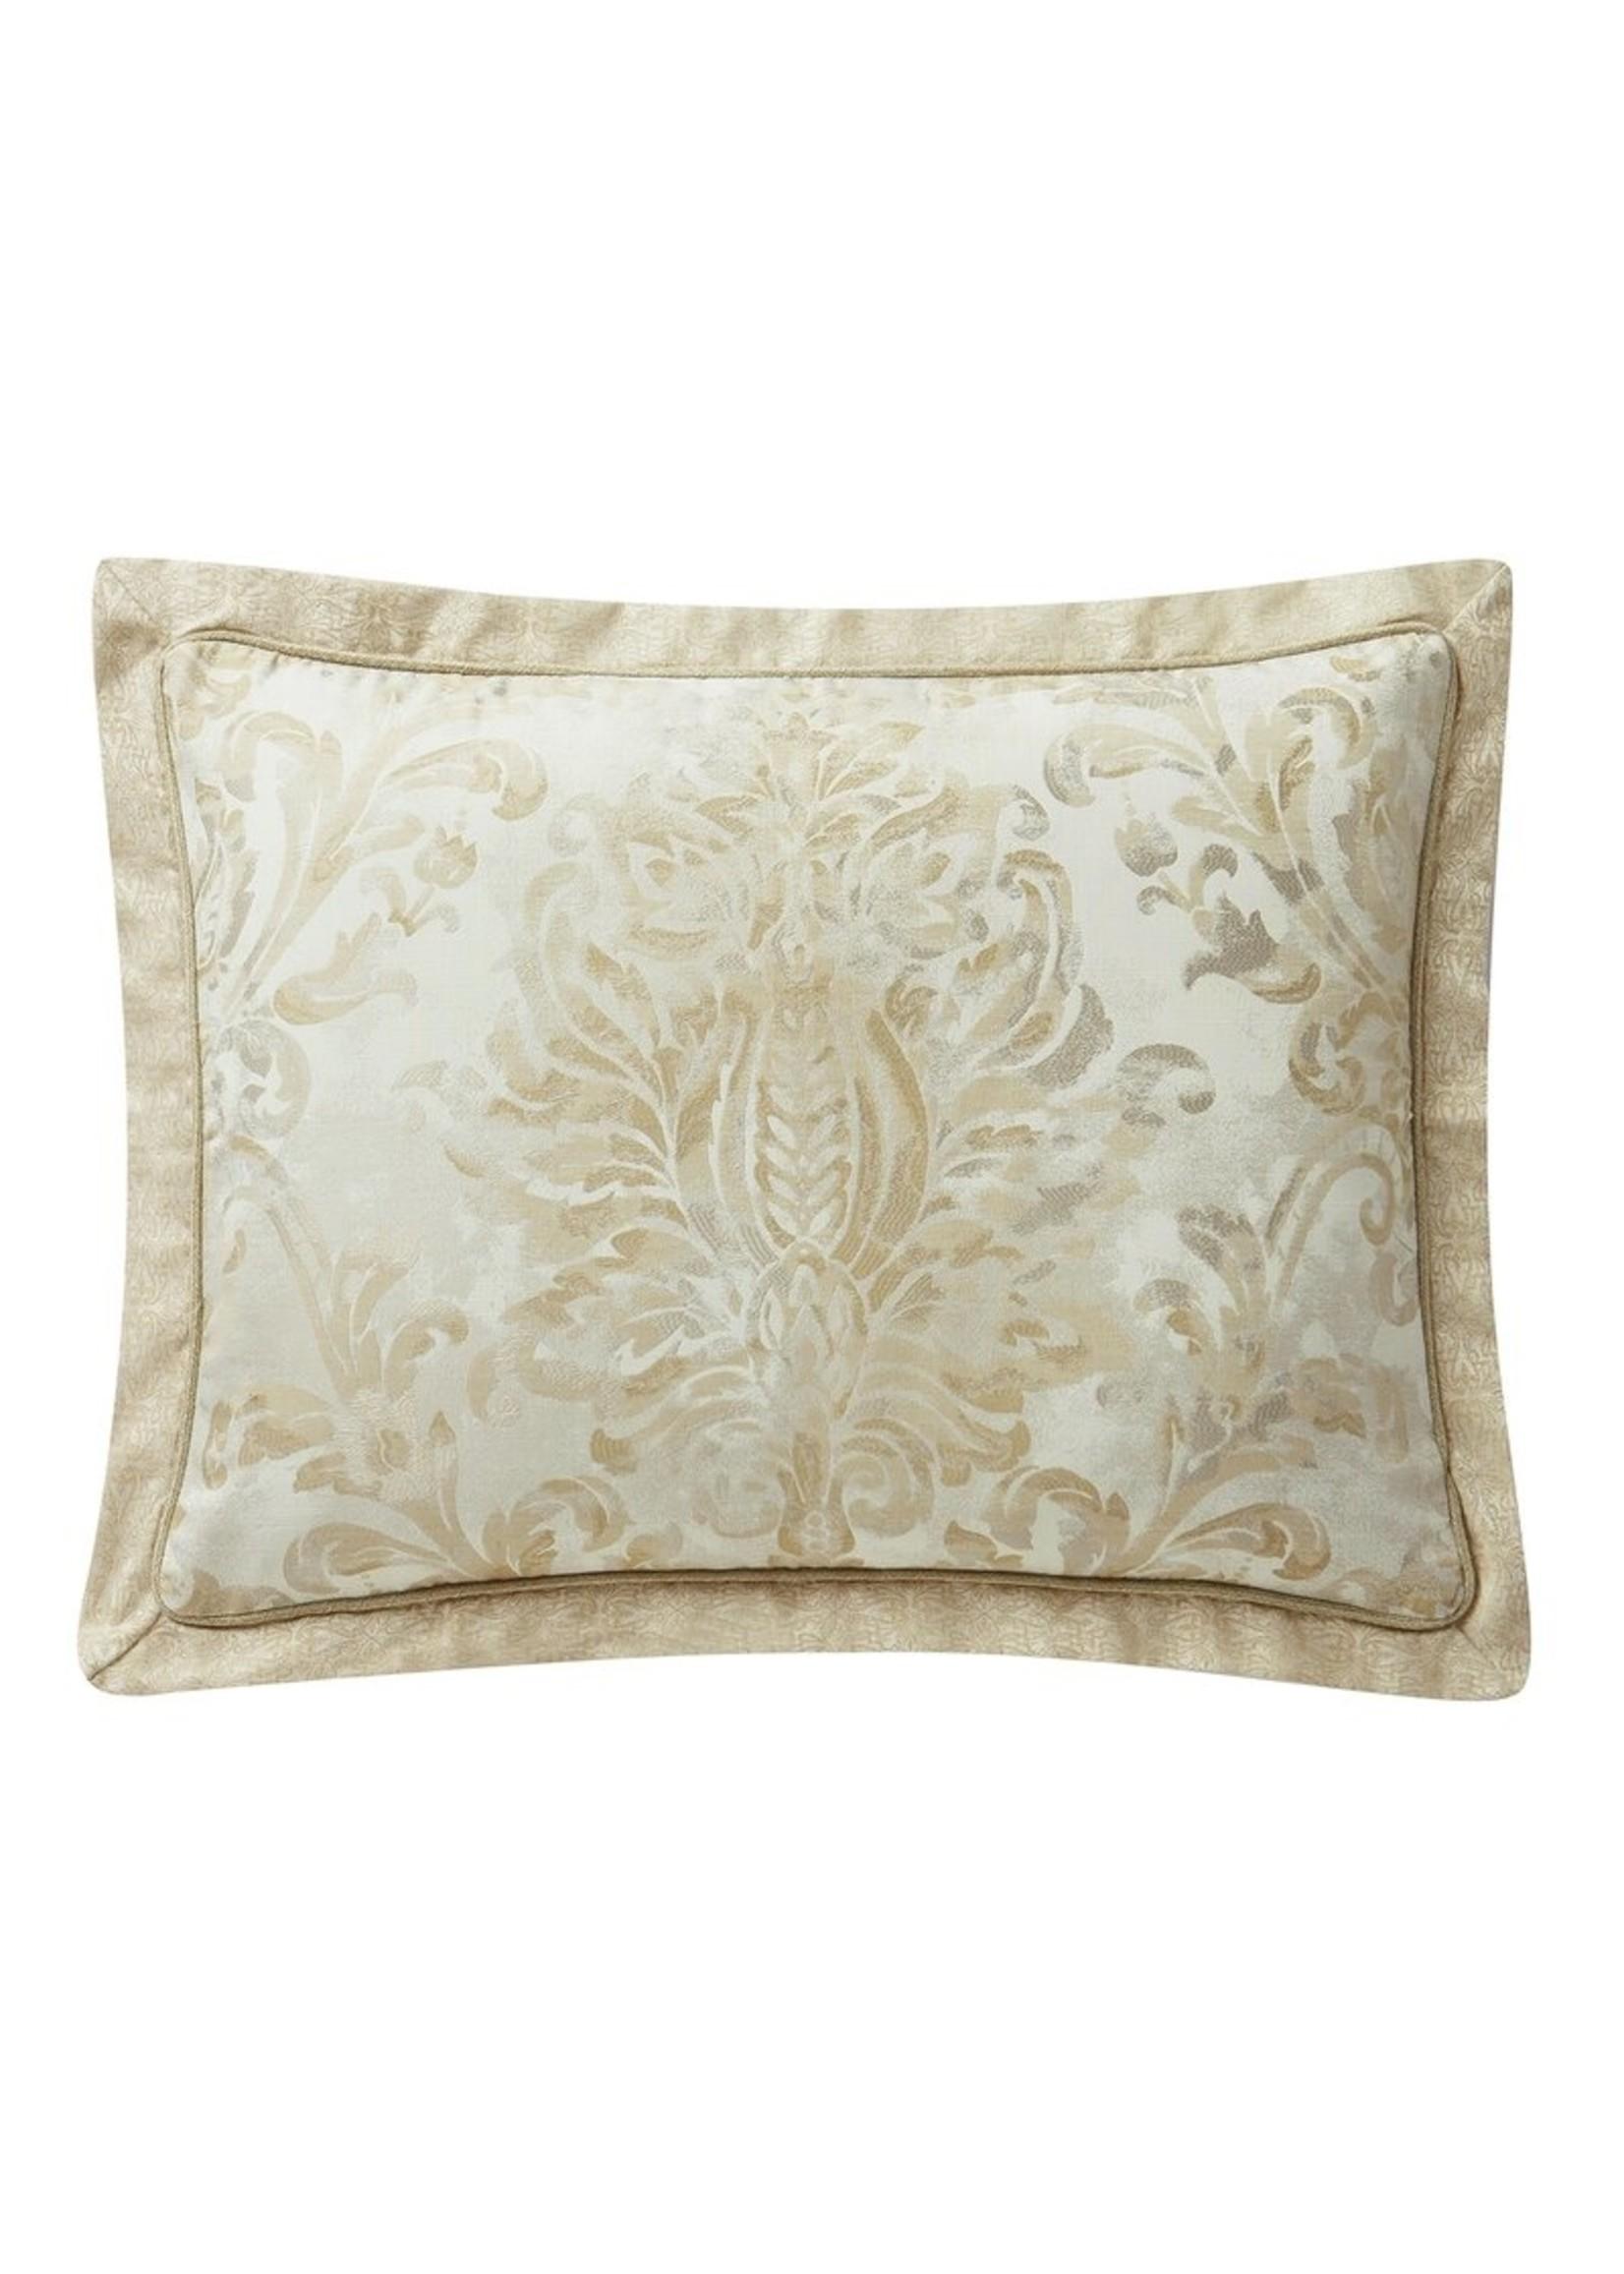 *King - Annalise Reversible Comforter Set - Final Sale